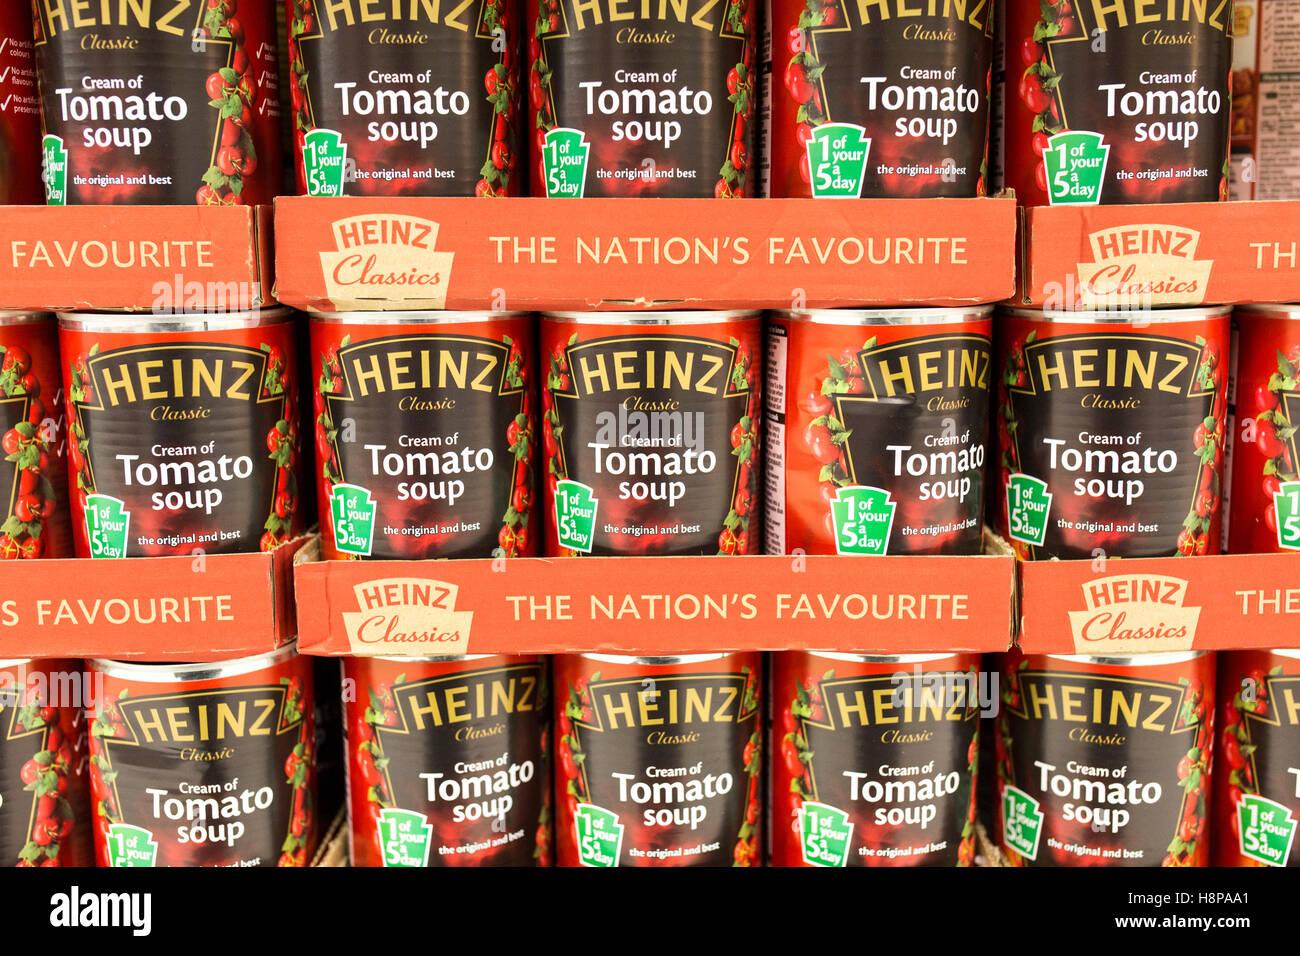 tins of Heinz tomato soup on supermarket shelves - Stock Image